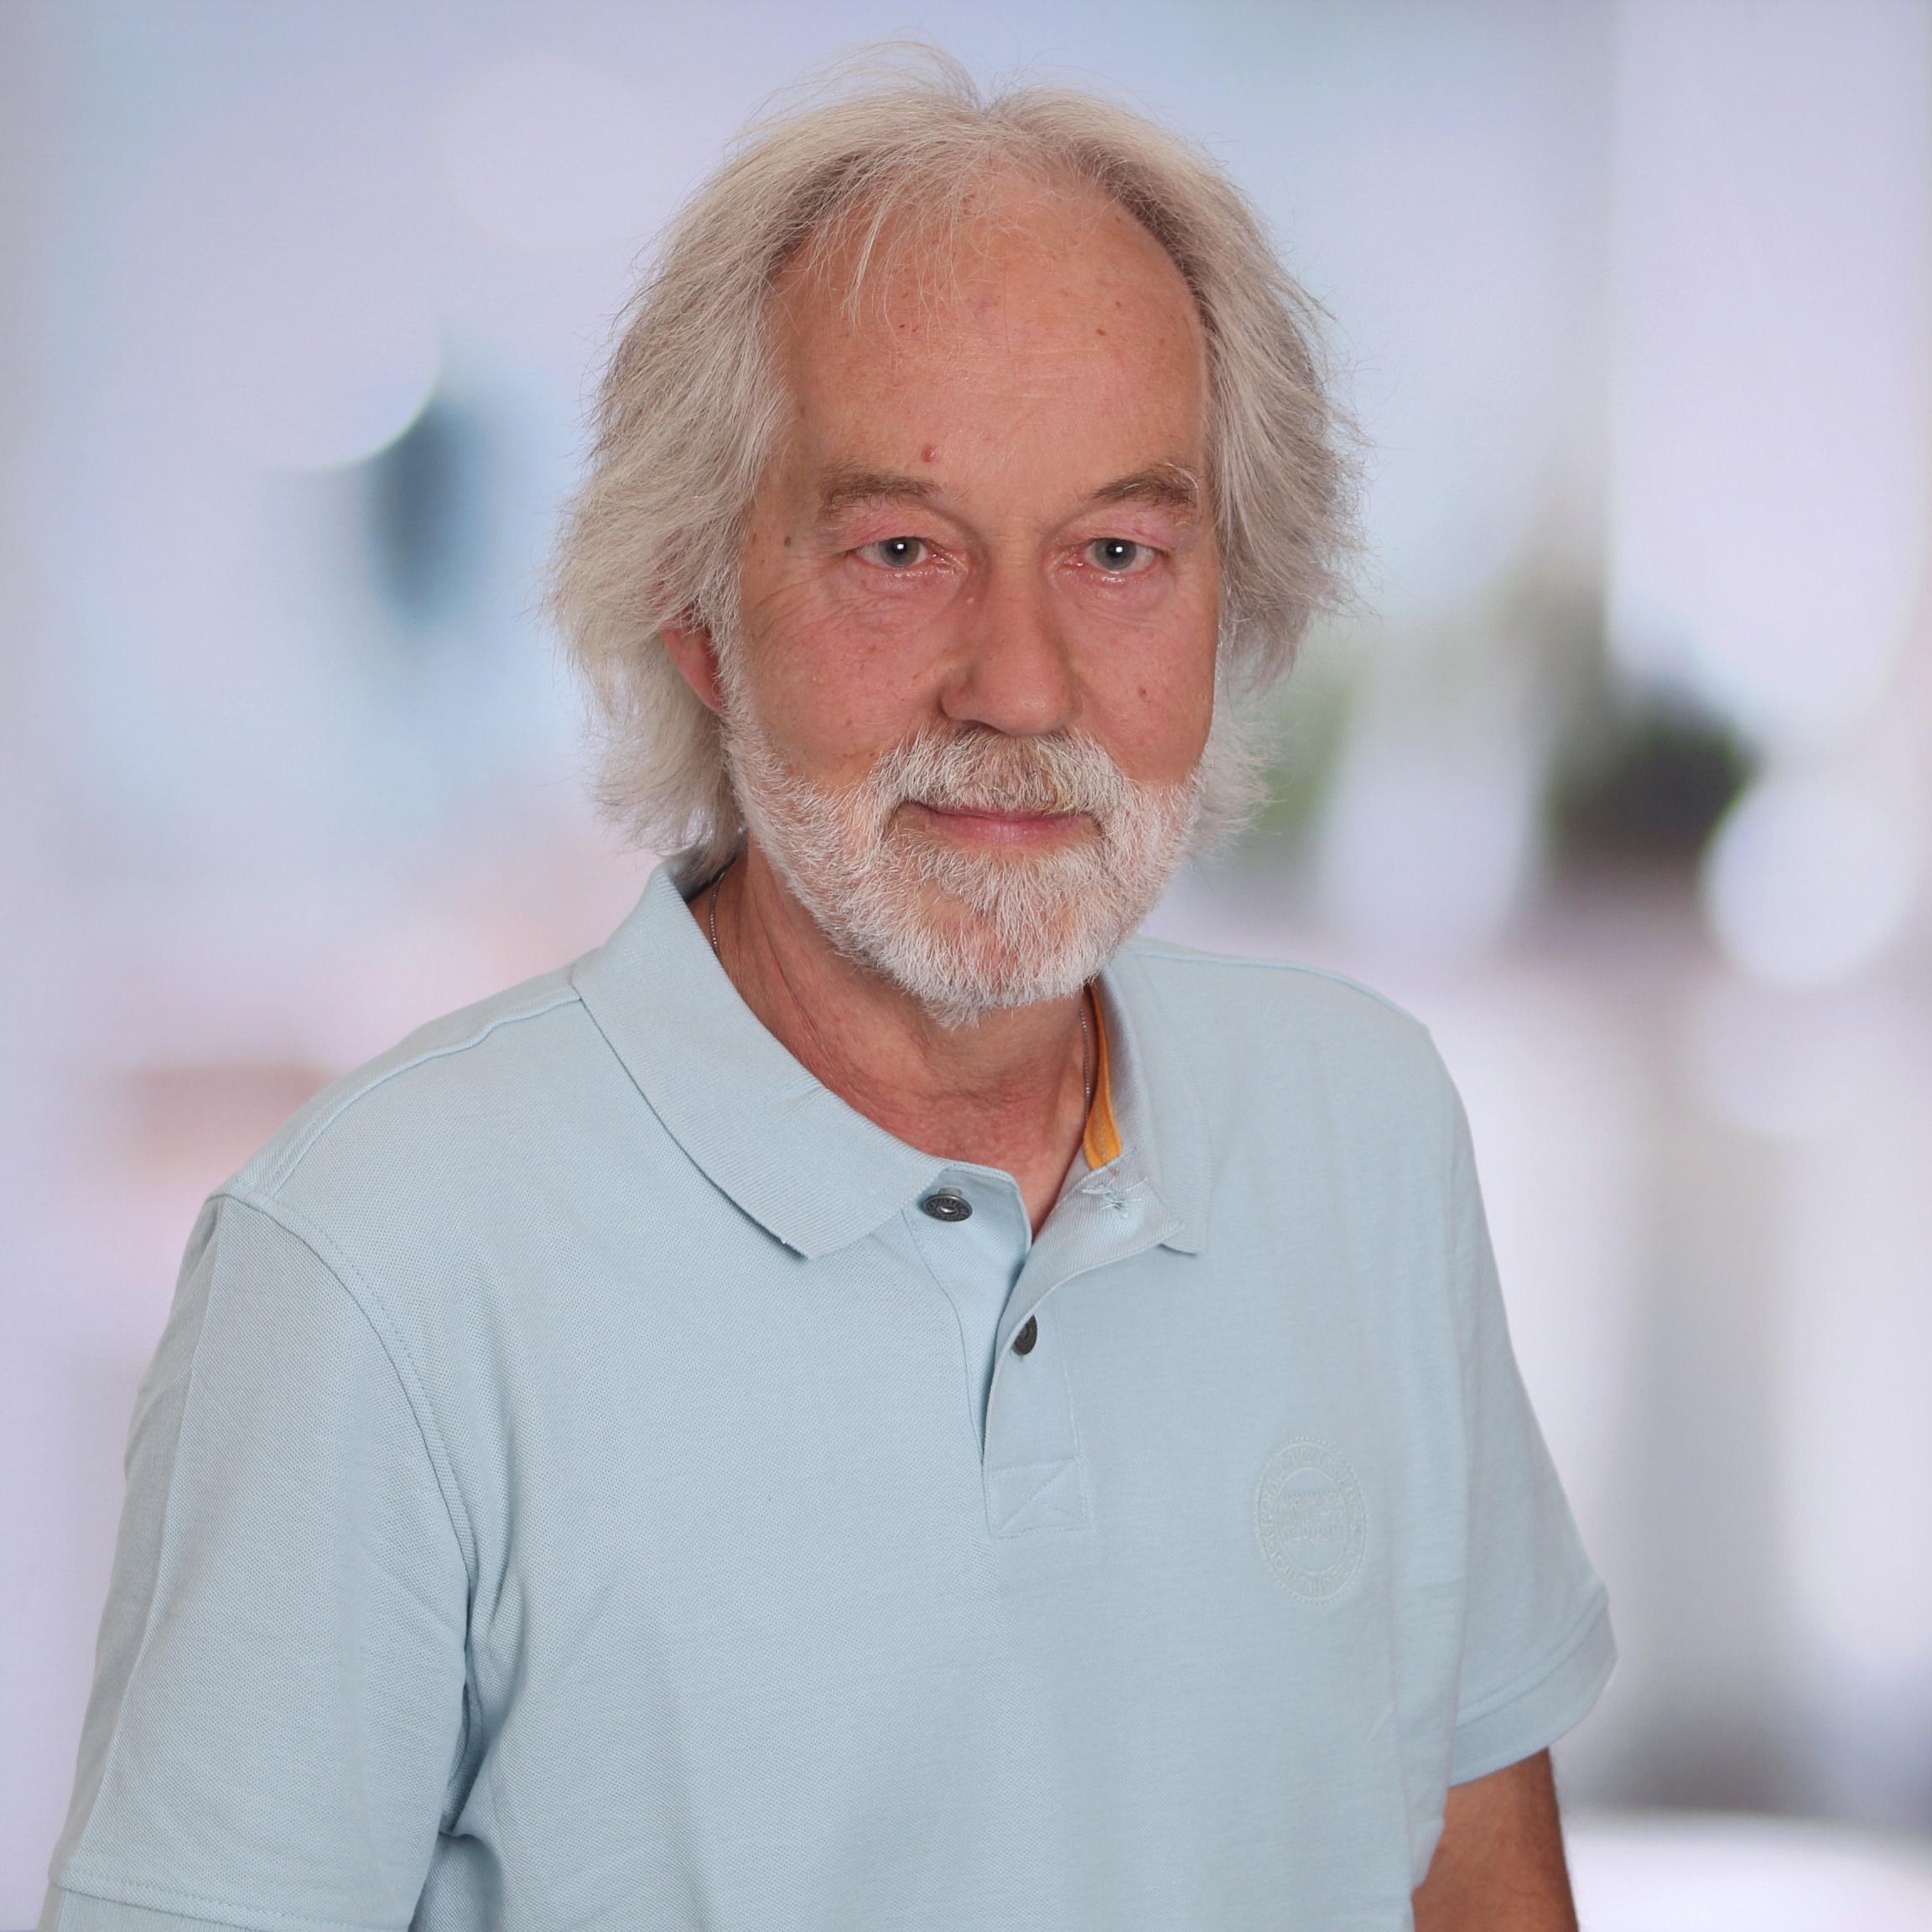 Knut Hencke